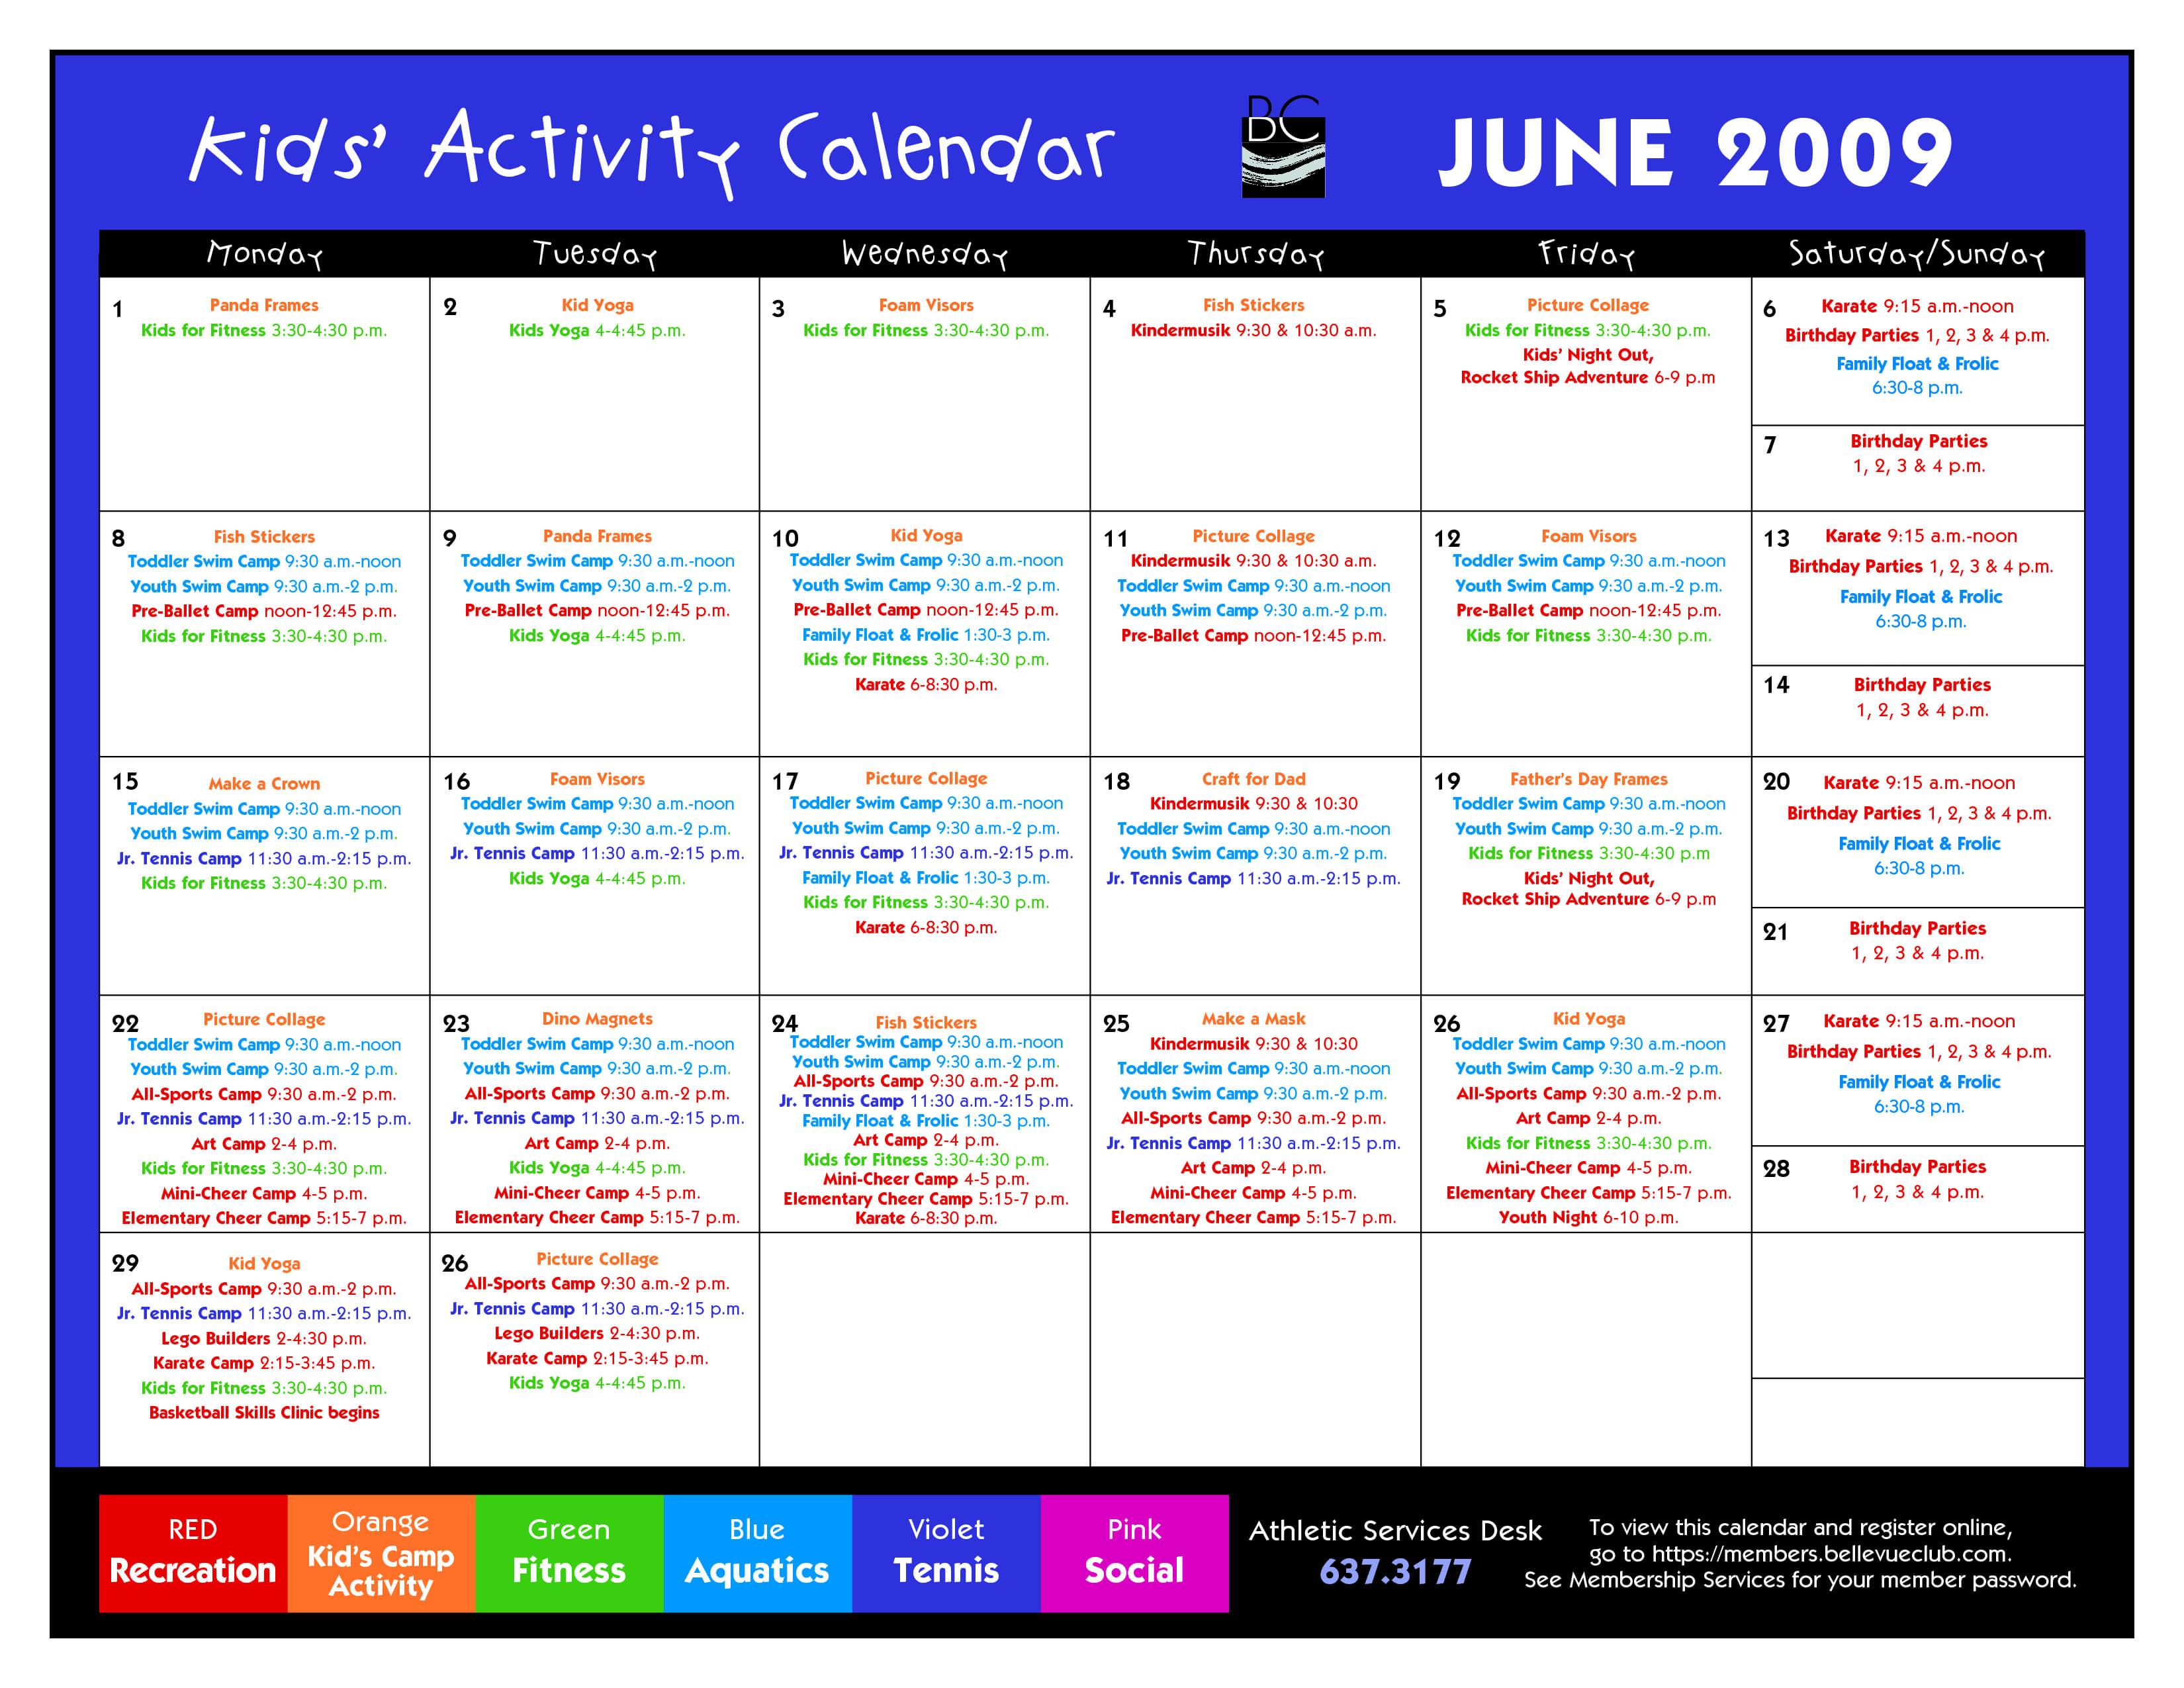 14 Blank Activity Calendar Template Images - Printable Blank regarding Blank Activity Calendar Template